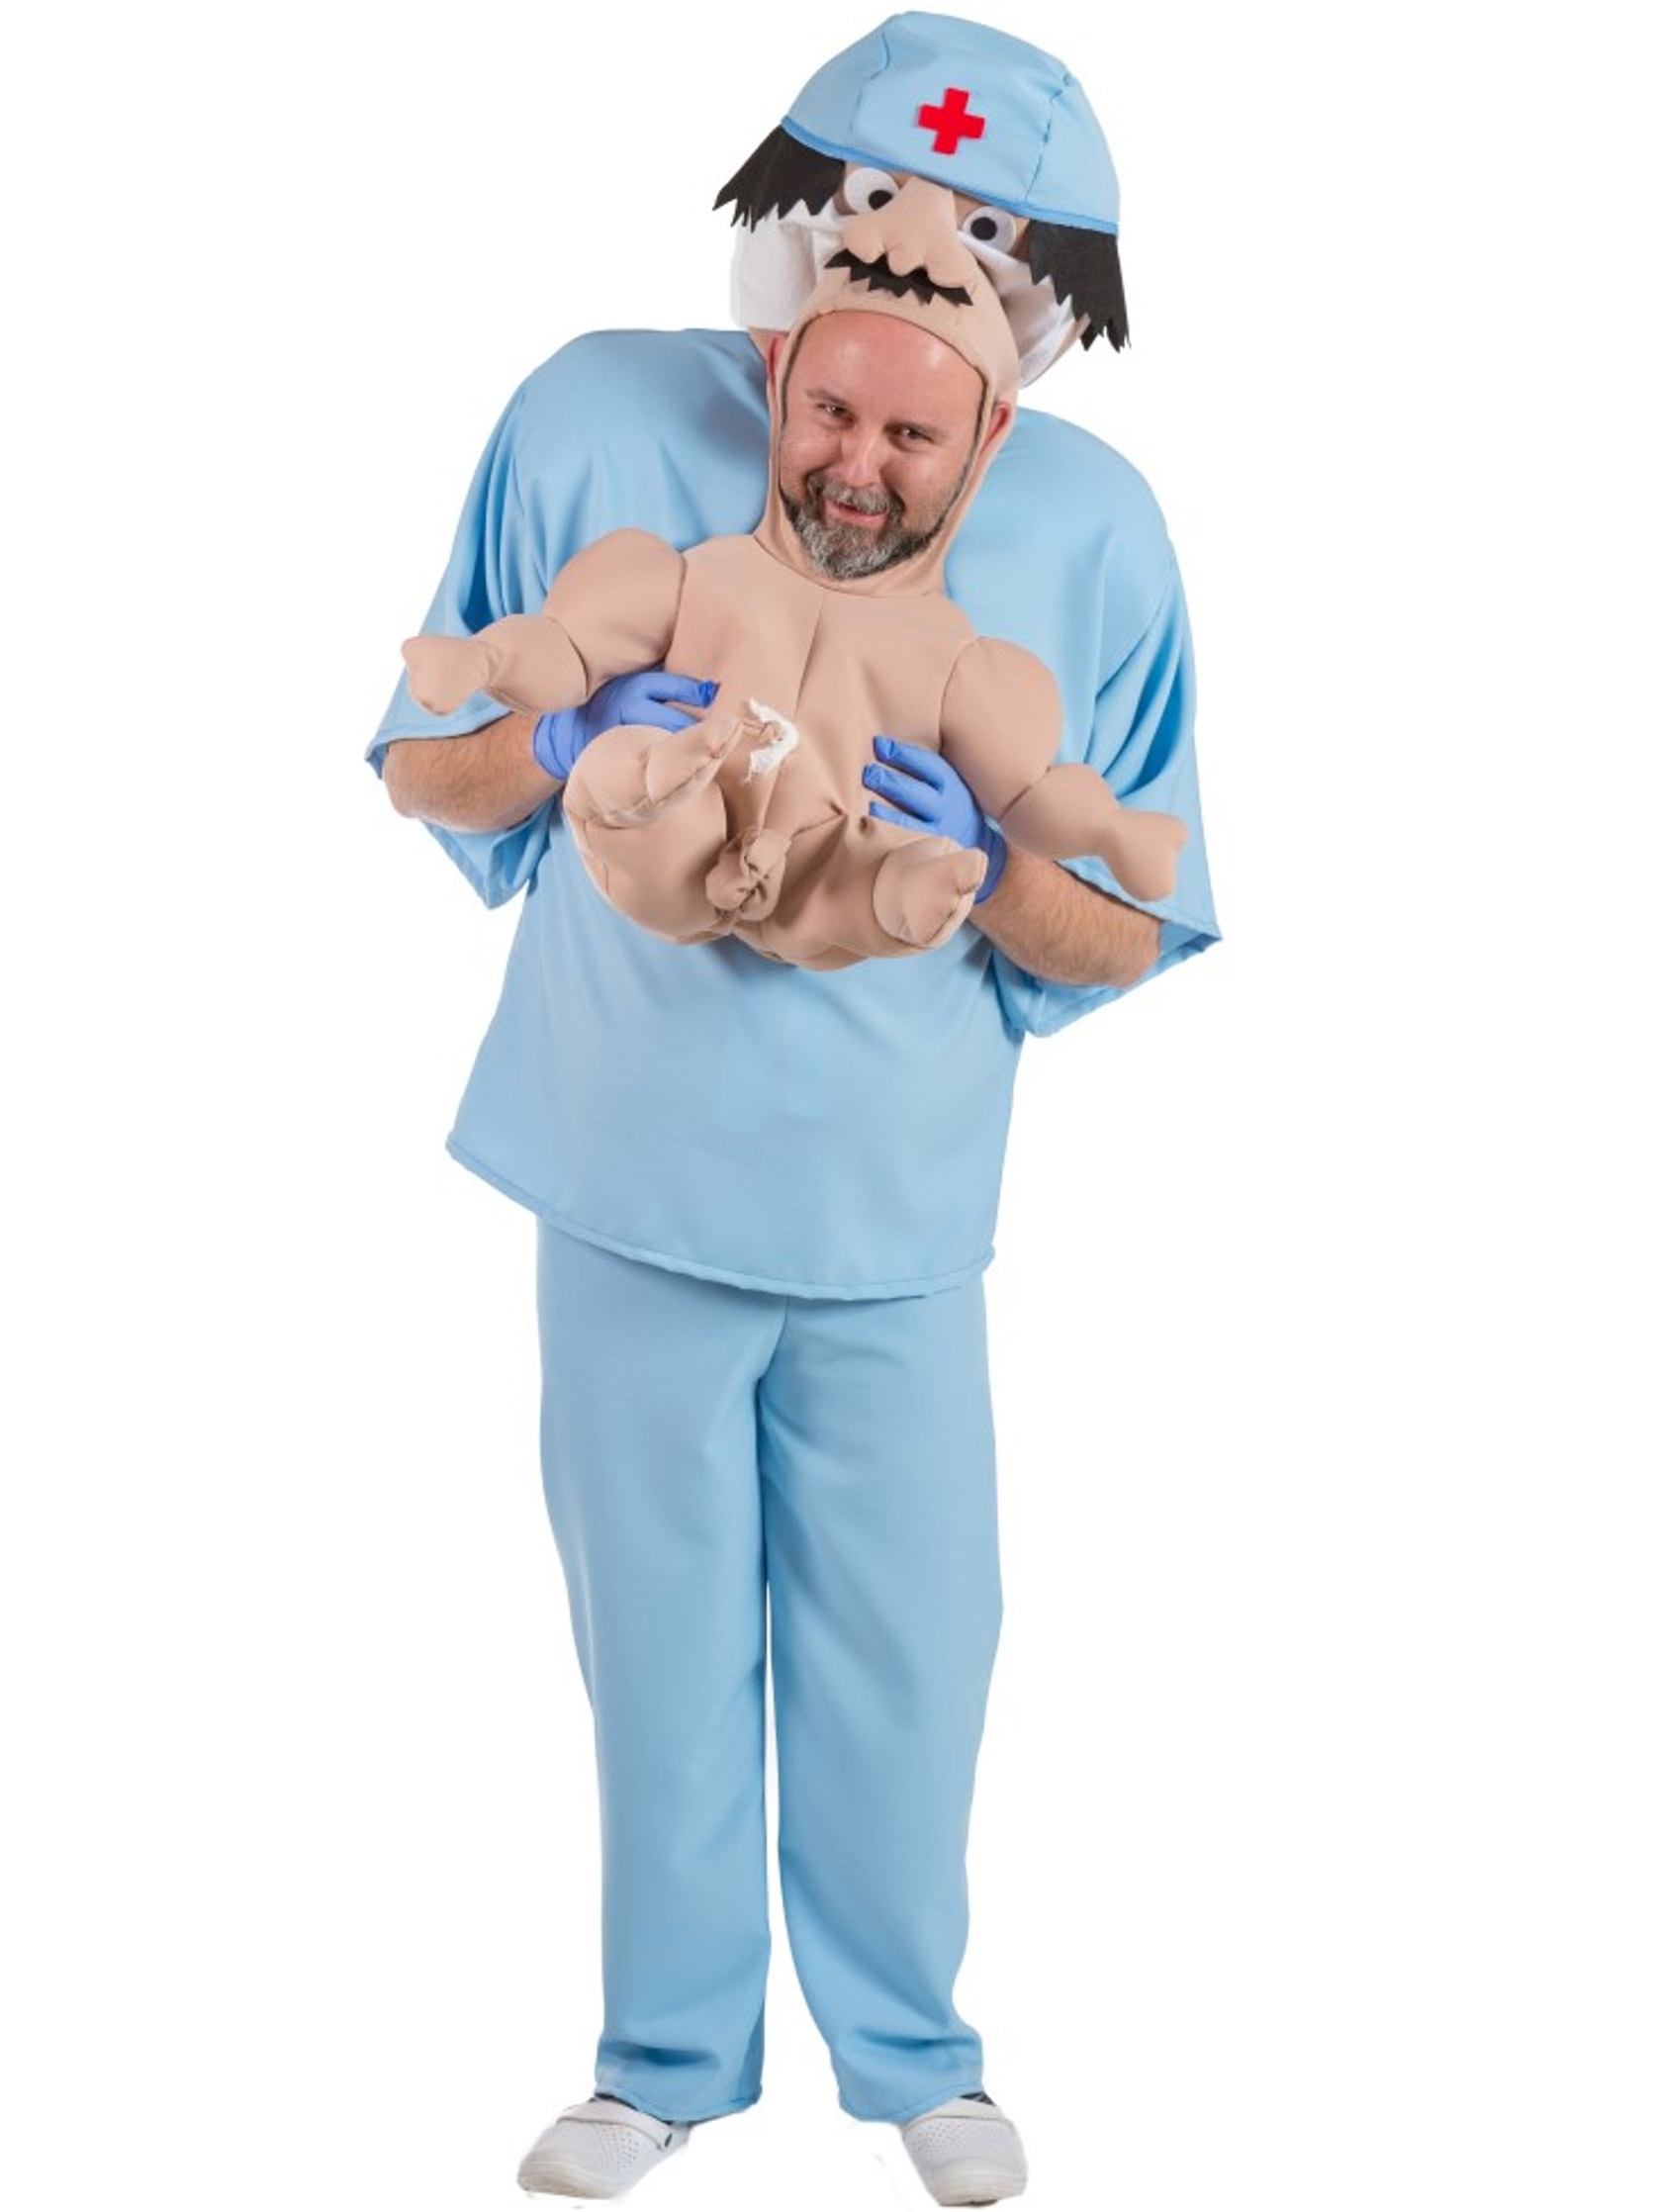 Arzt Mit Baby Carry Me Kostum Blau Gunstige Faschings Kostume Bei